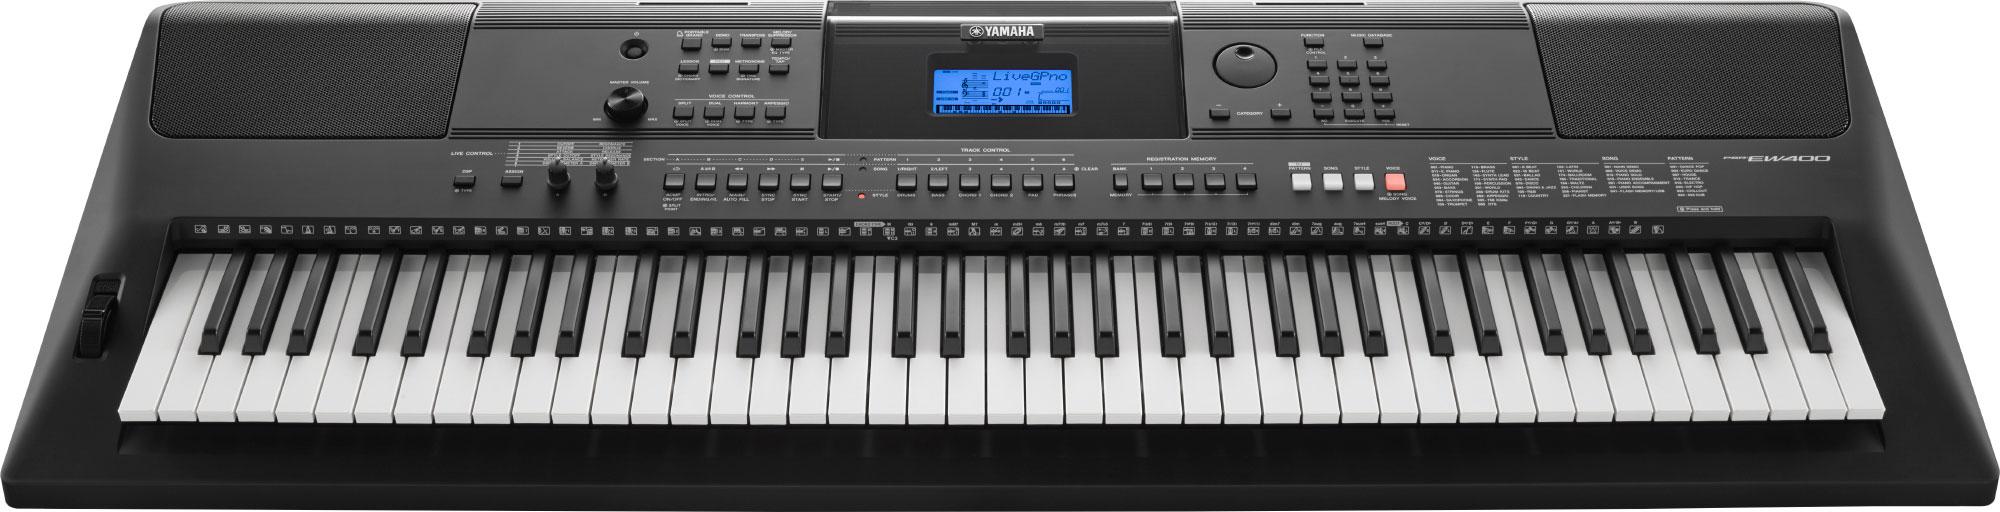 Image Result For Yamaha Keyboard Ew